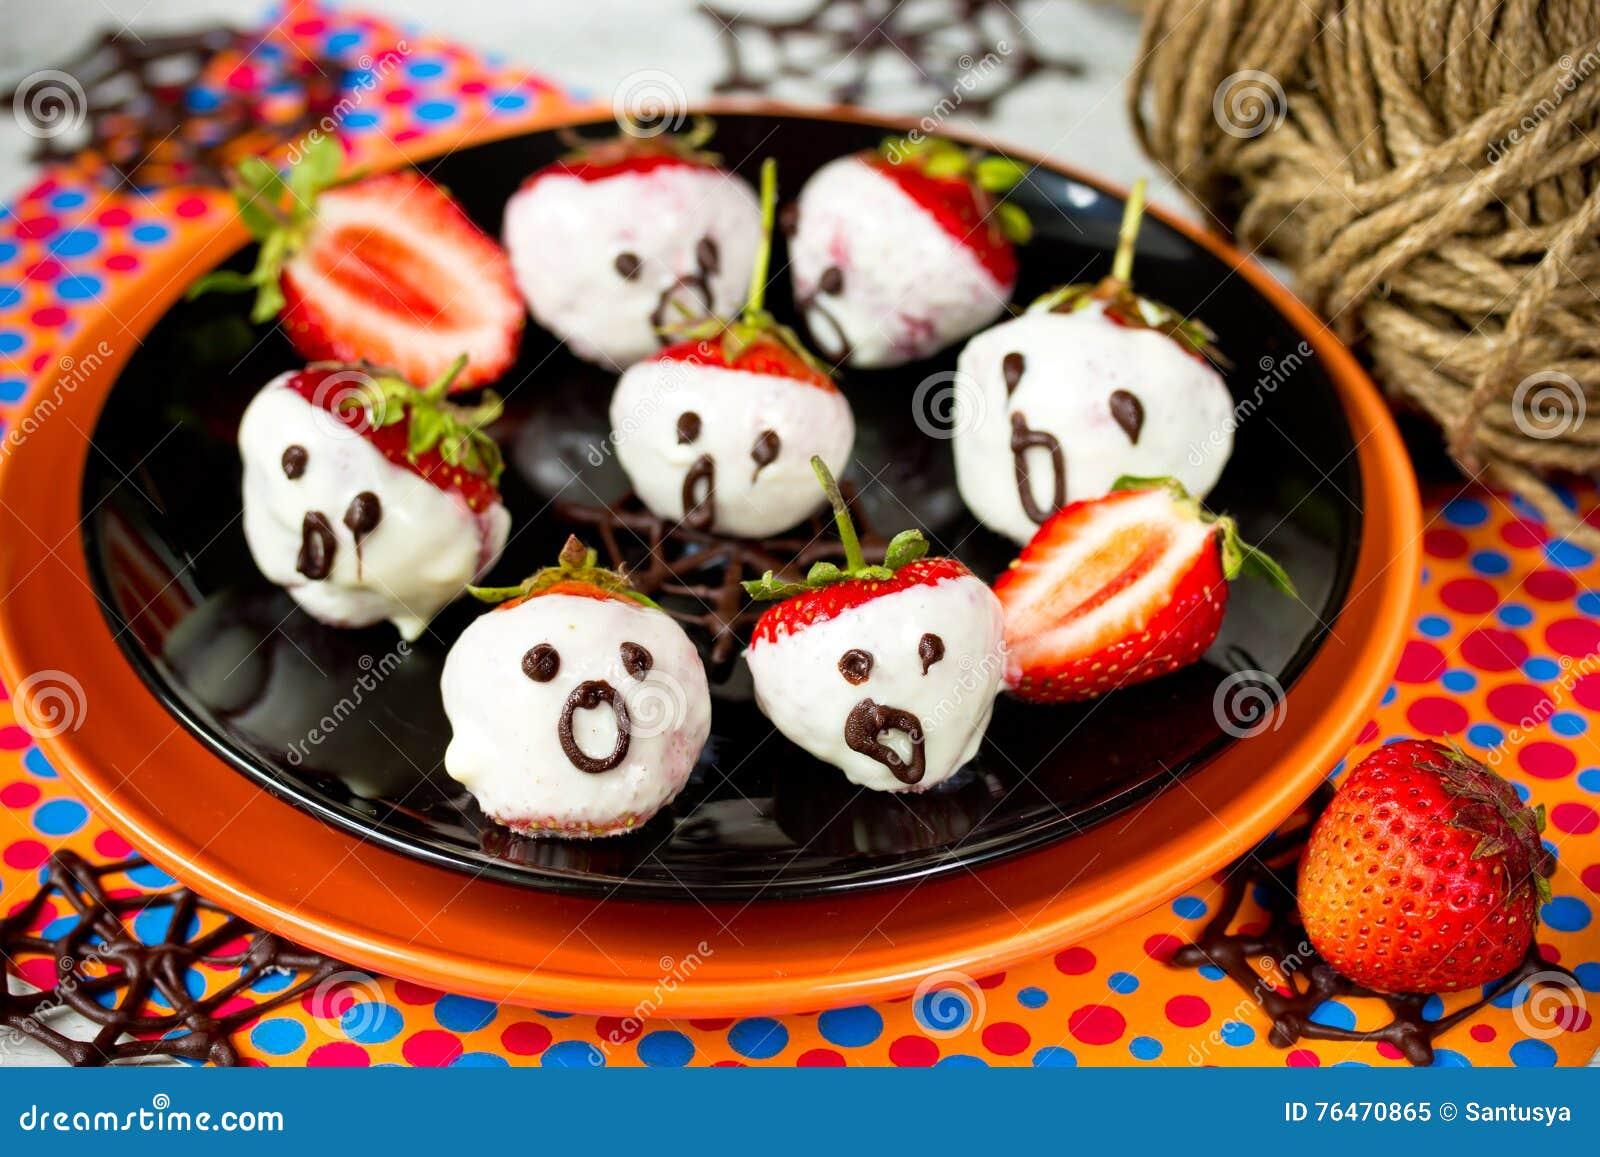 Halloween Dessert Strawberries In Melted White Chocolate